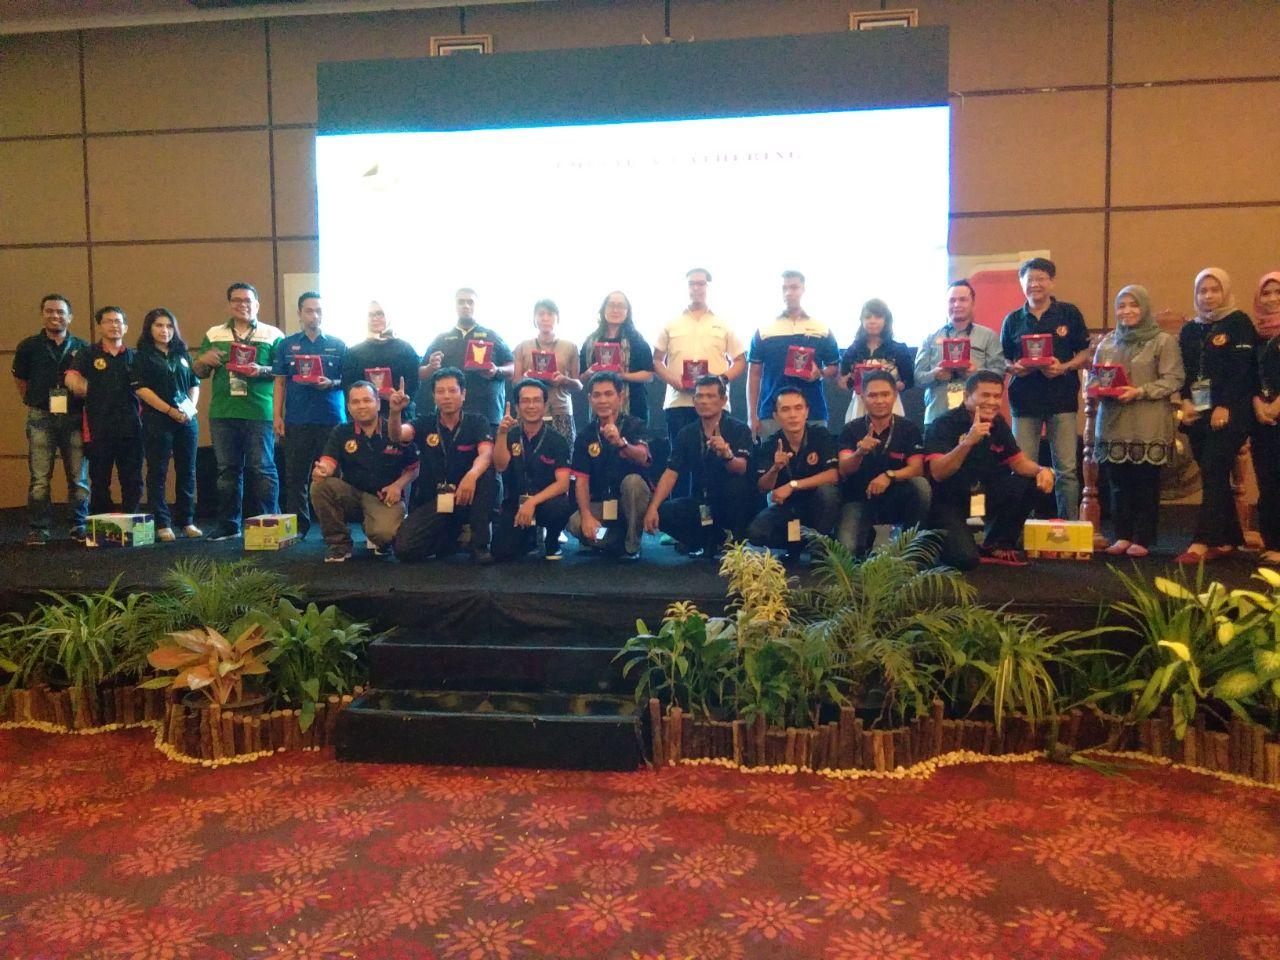 Penta Power Indonesia News - Jual Water Heater (Heat Pump) / Pemanas Air di PADANG